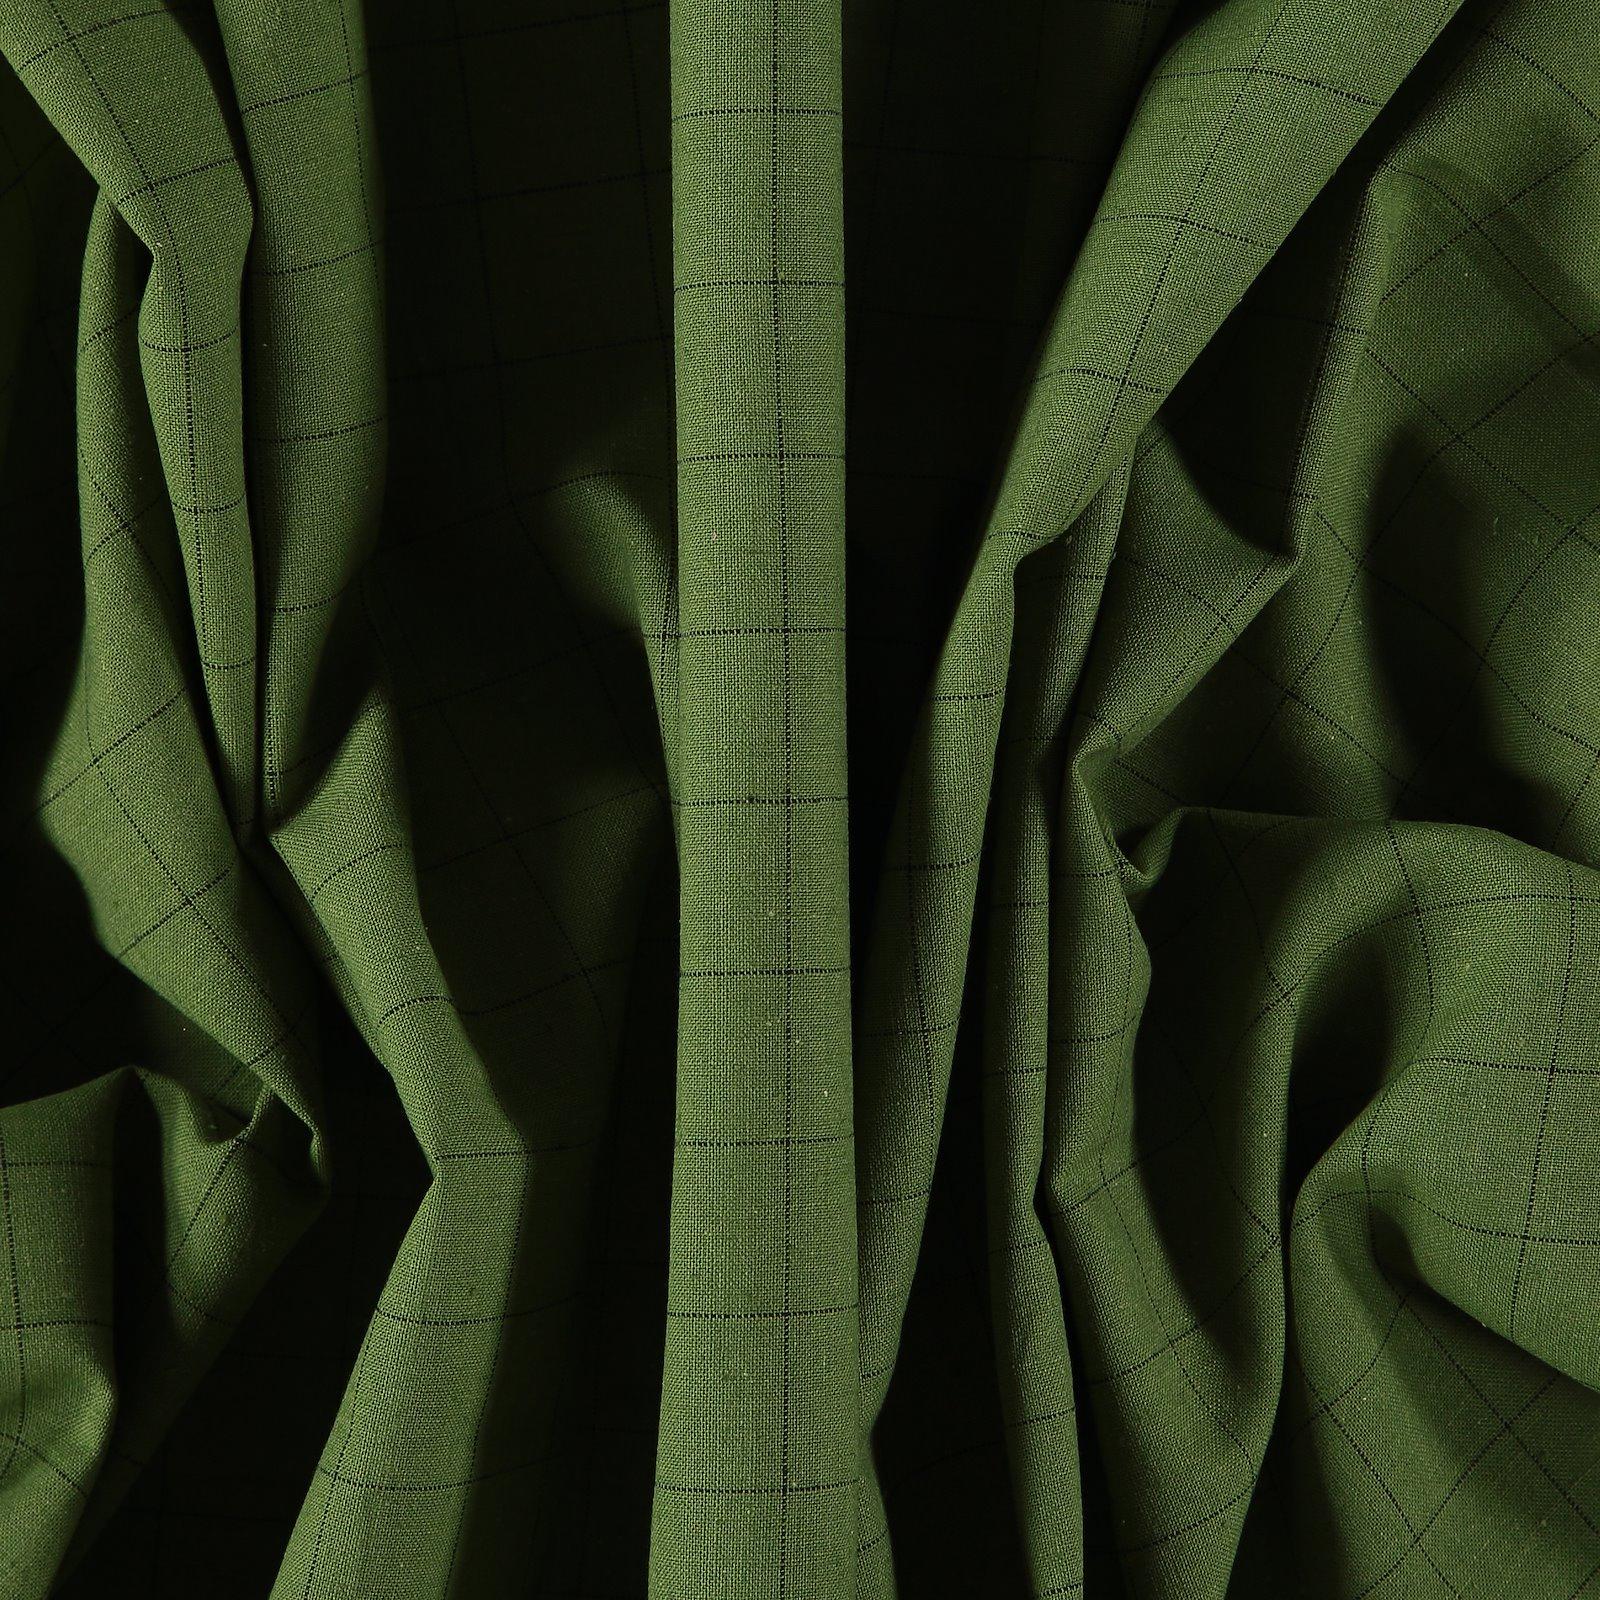 Yarn dyed check light army green/black